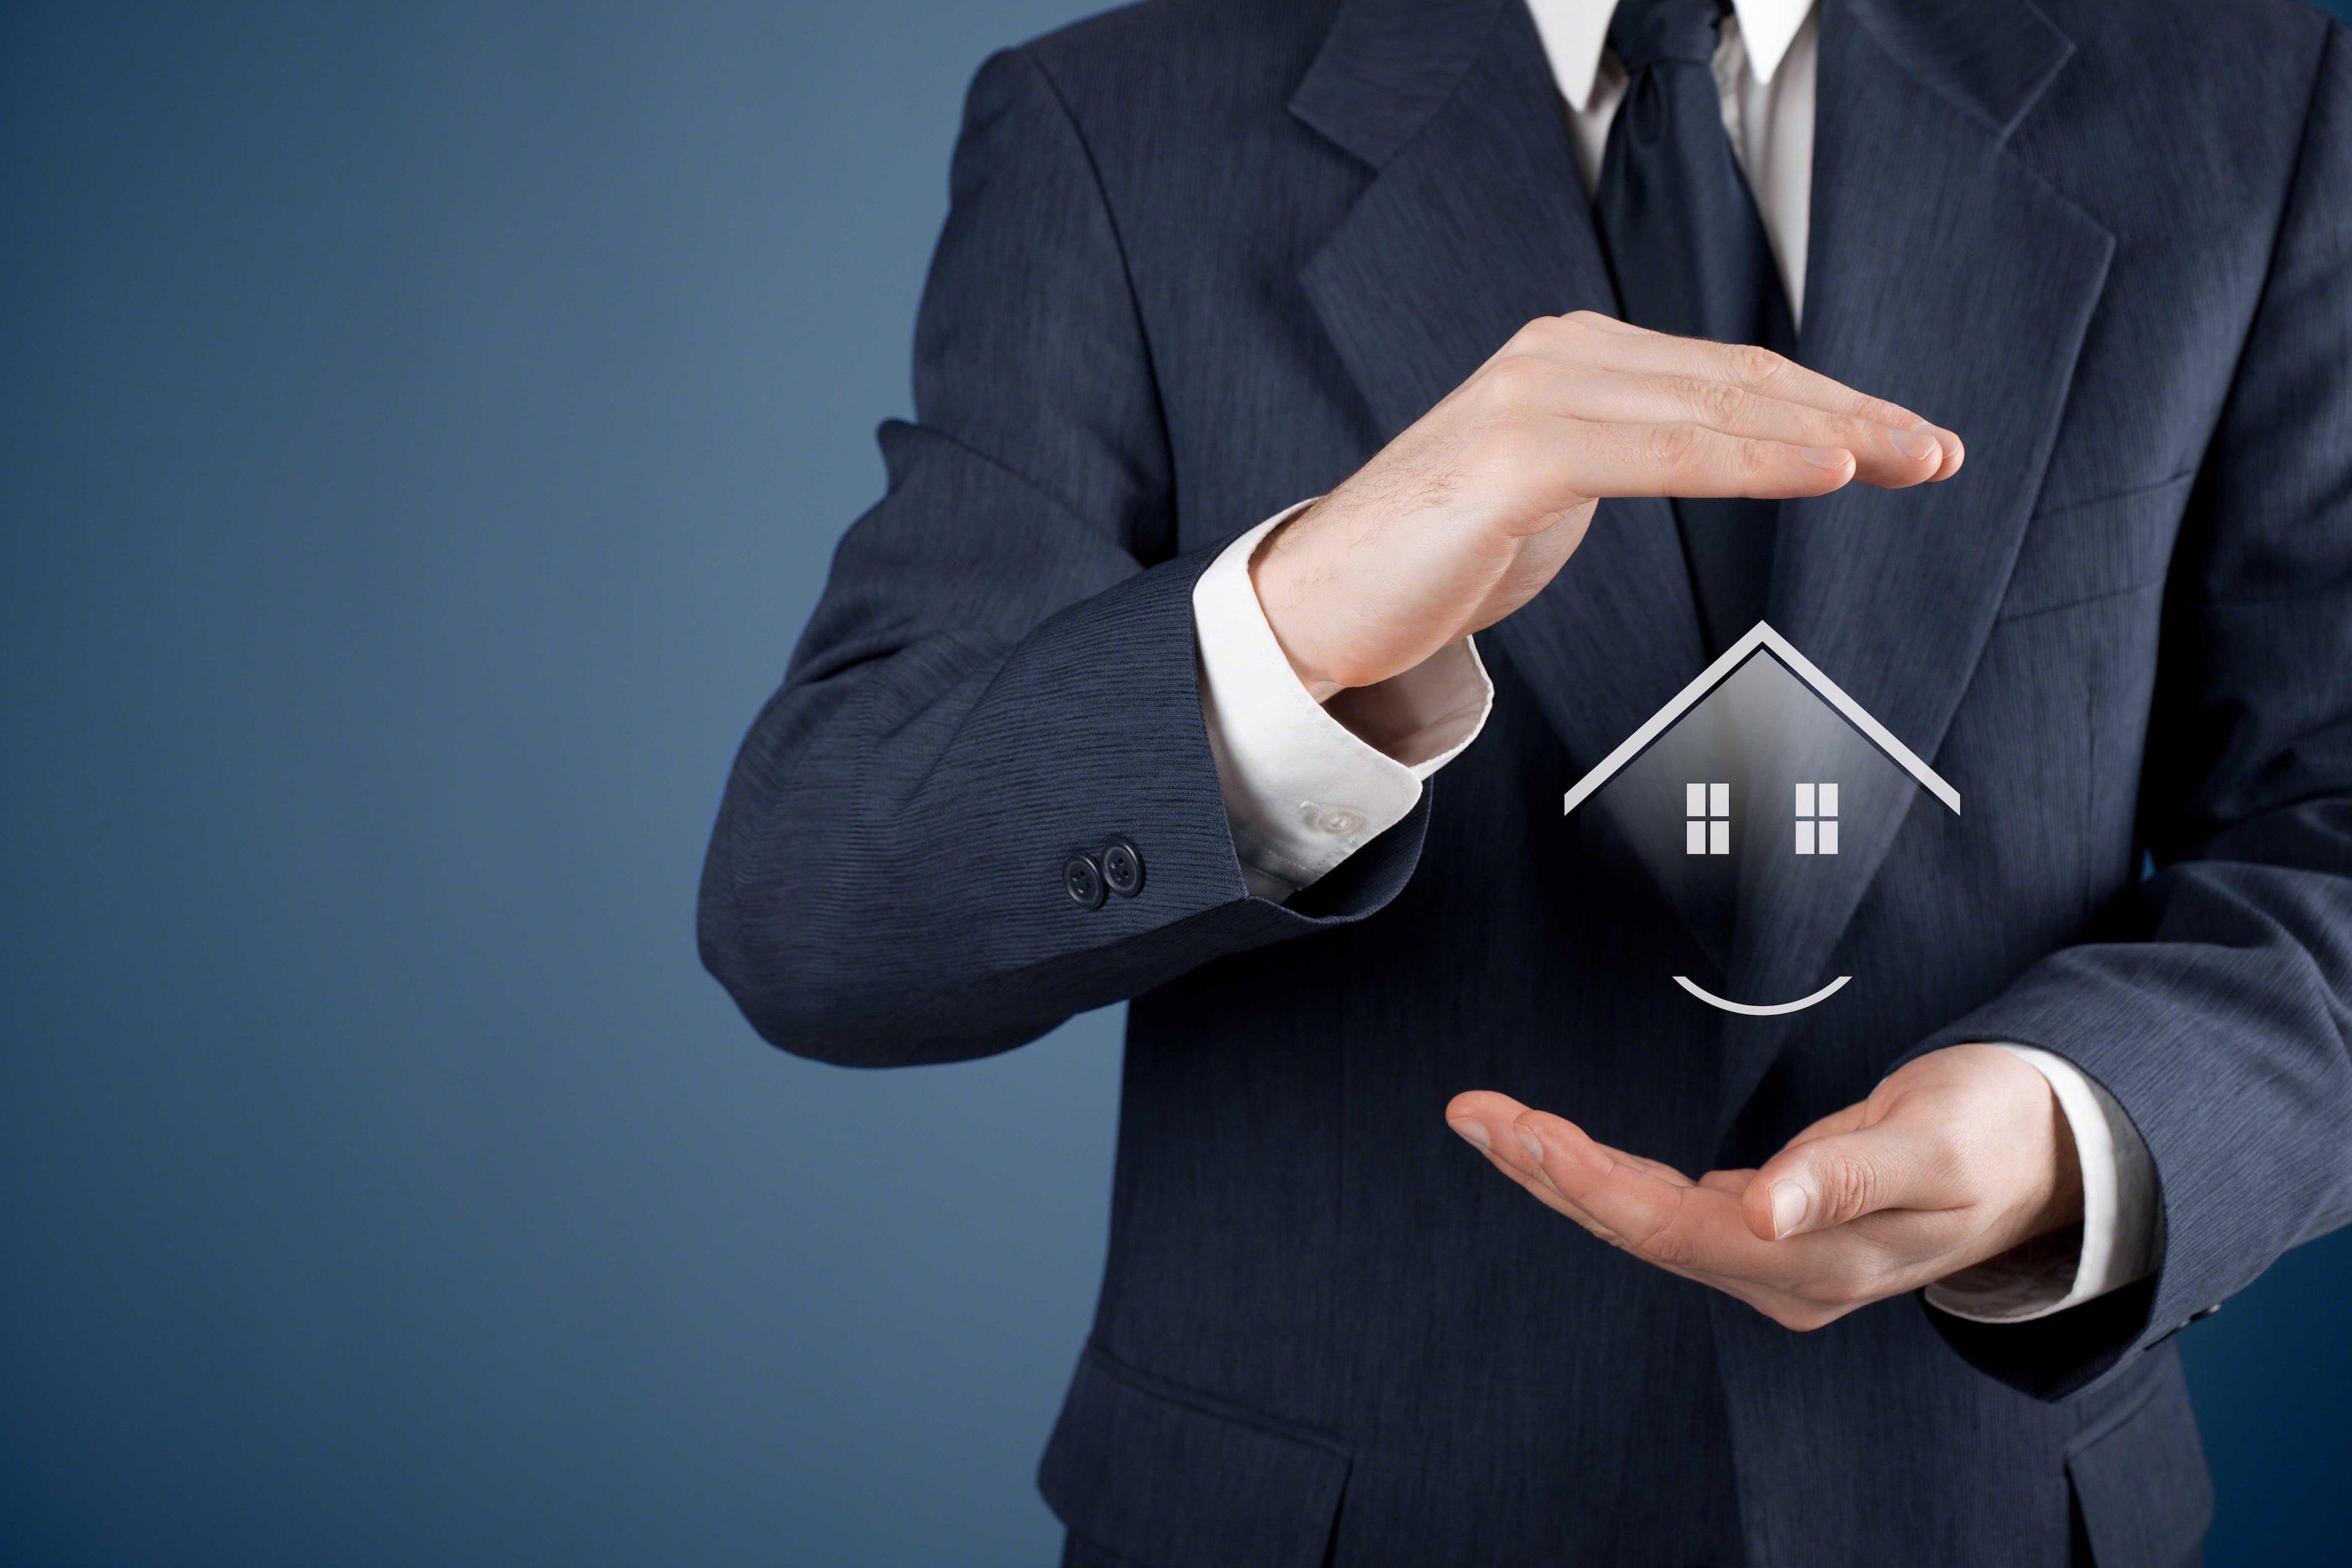 real_estate_agent-3840x2560.jpg